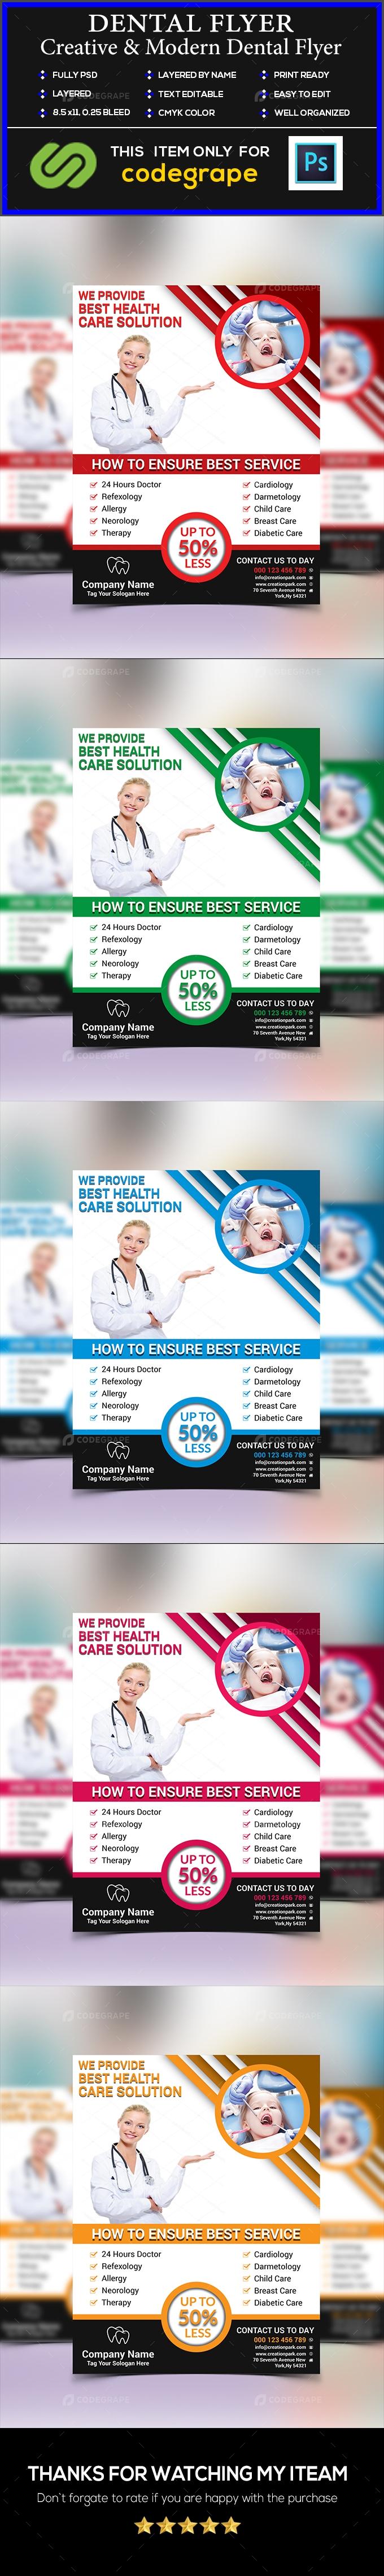 Corporate Dental Flyer